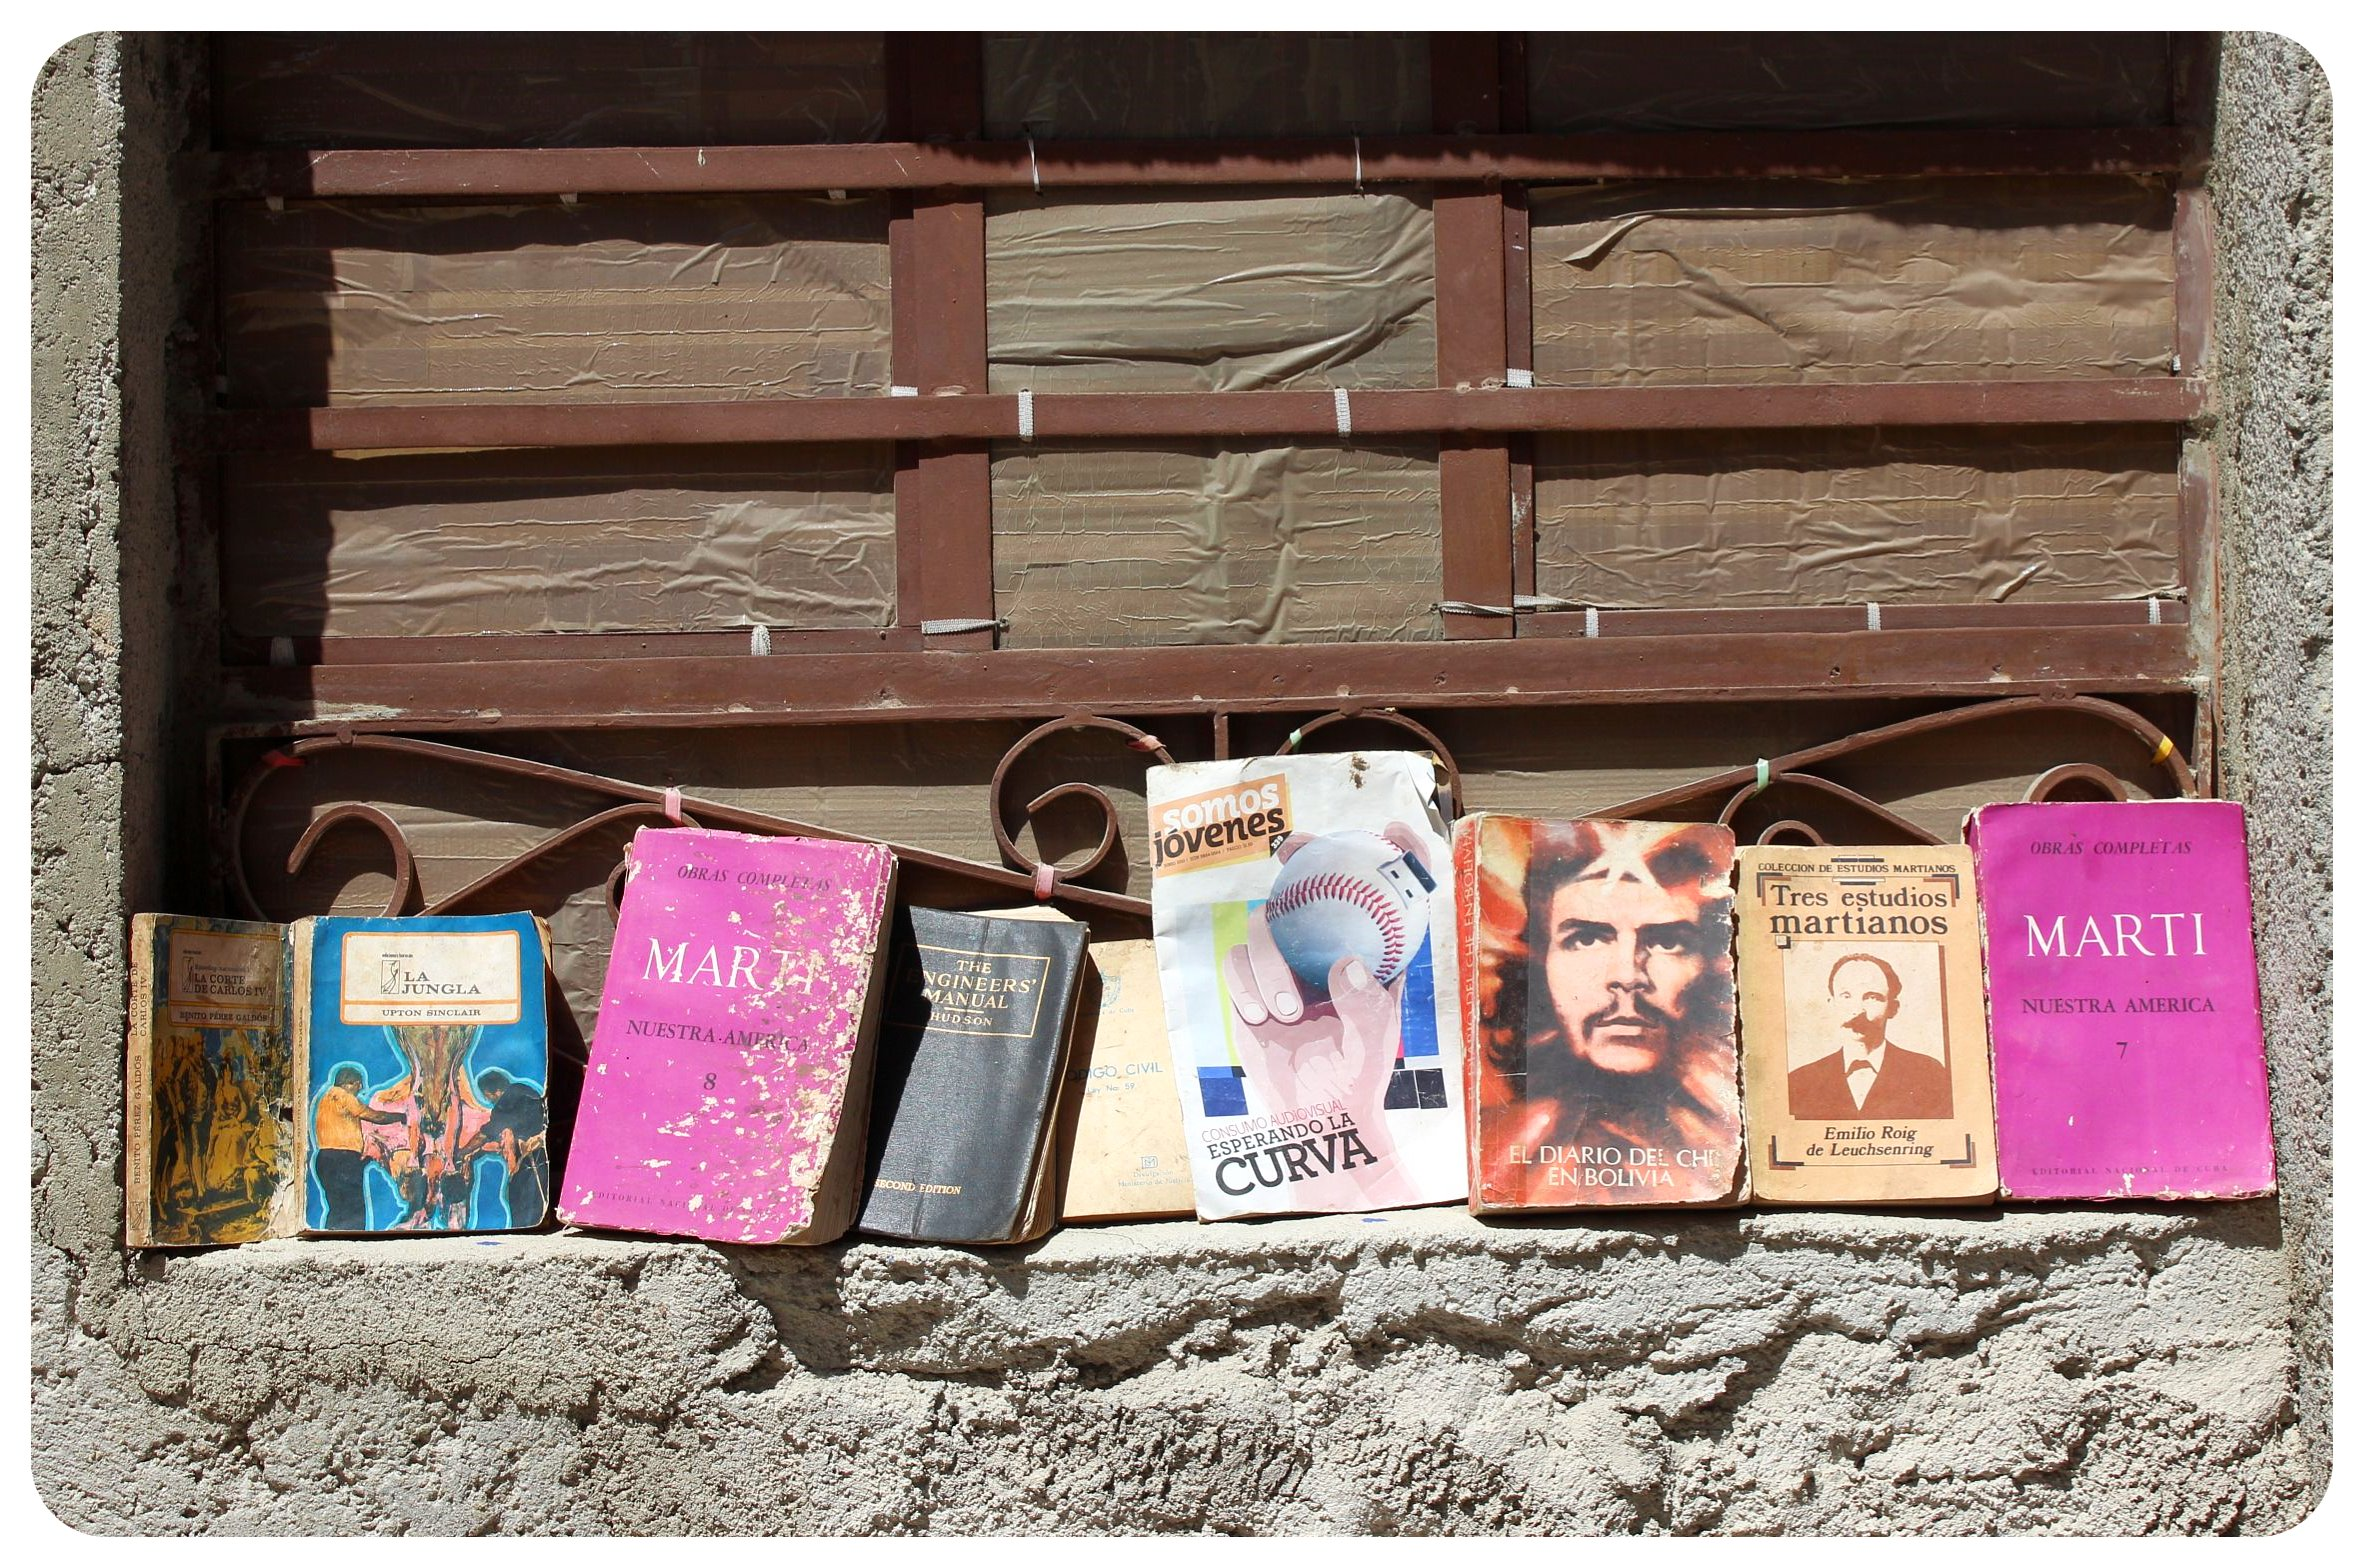 havana bookstore